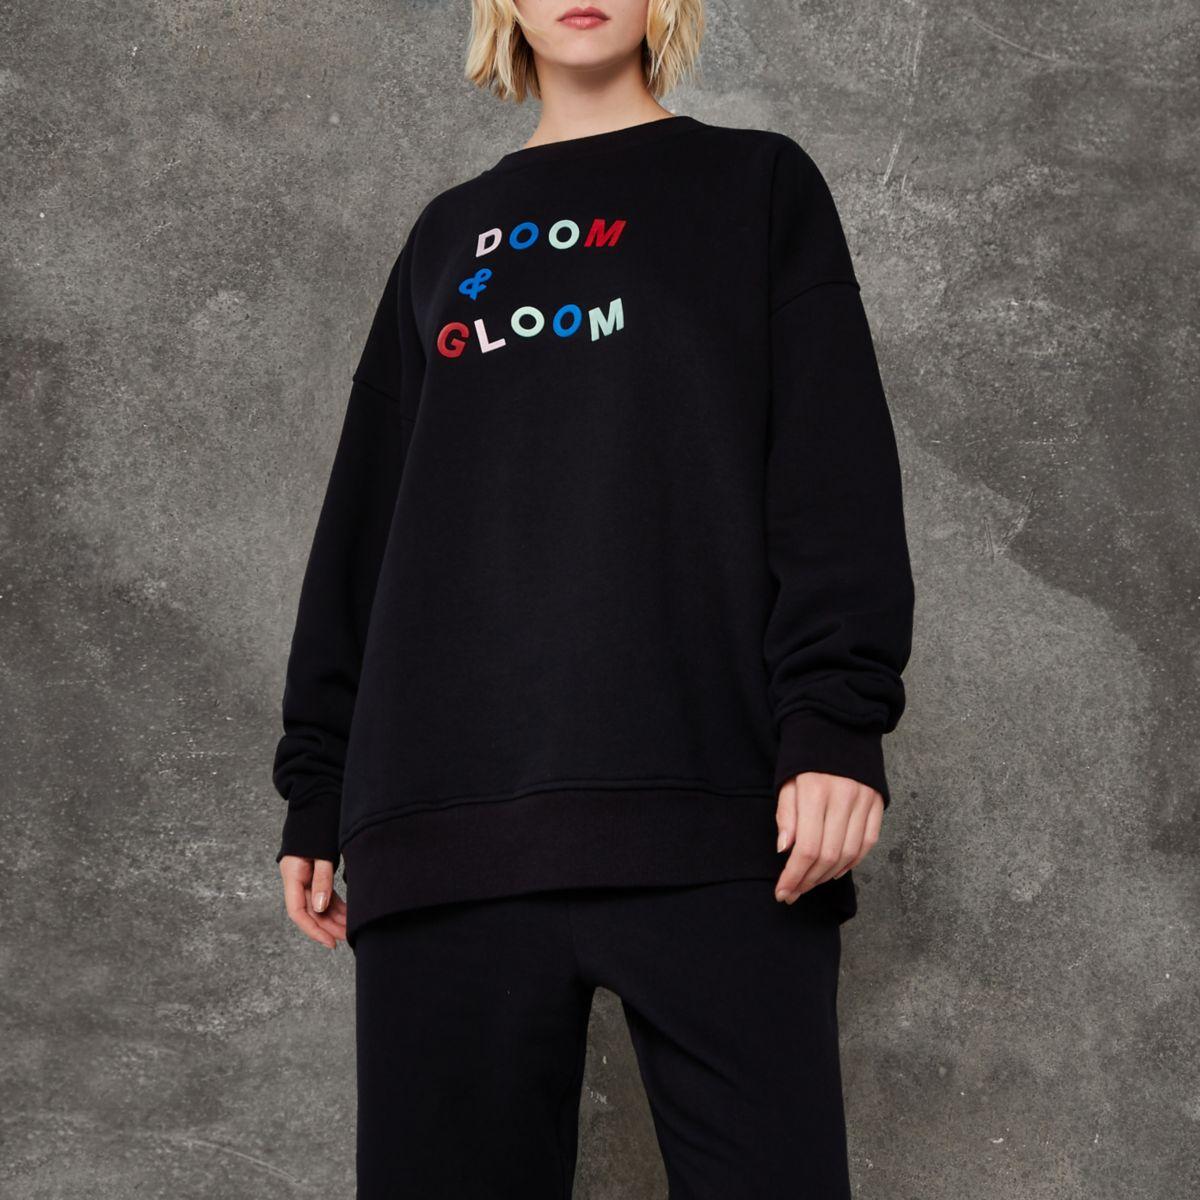 Black Ashish 'doom and gloom' jumper